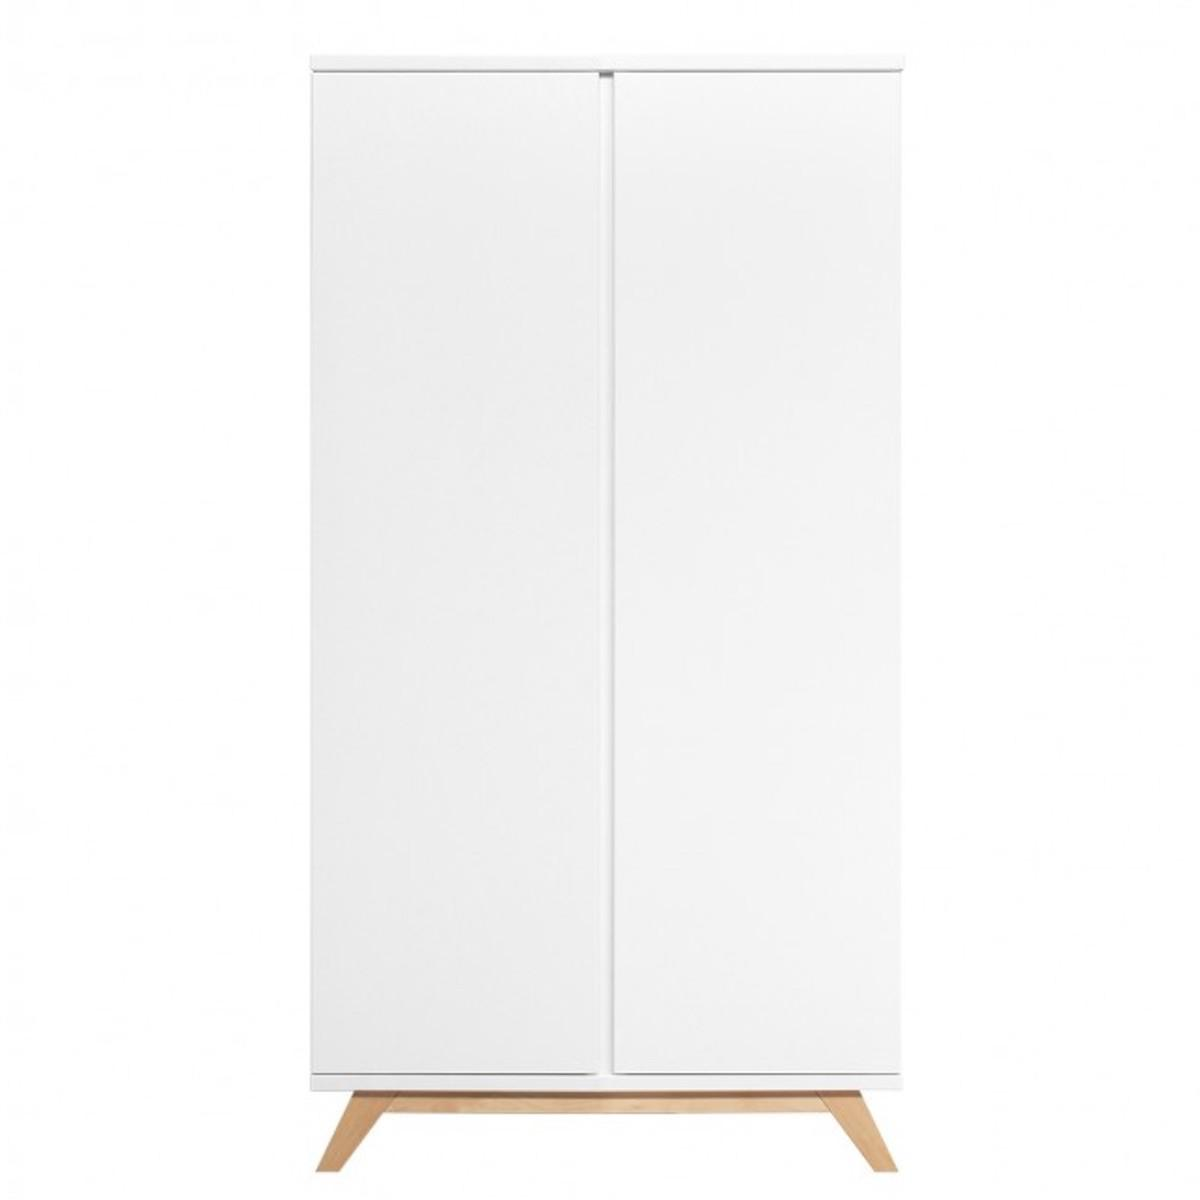 Armoire 2 portes LYNN Bopita blanc-naturel